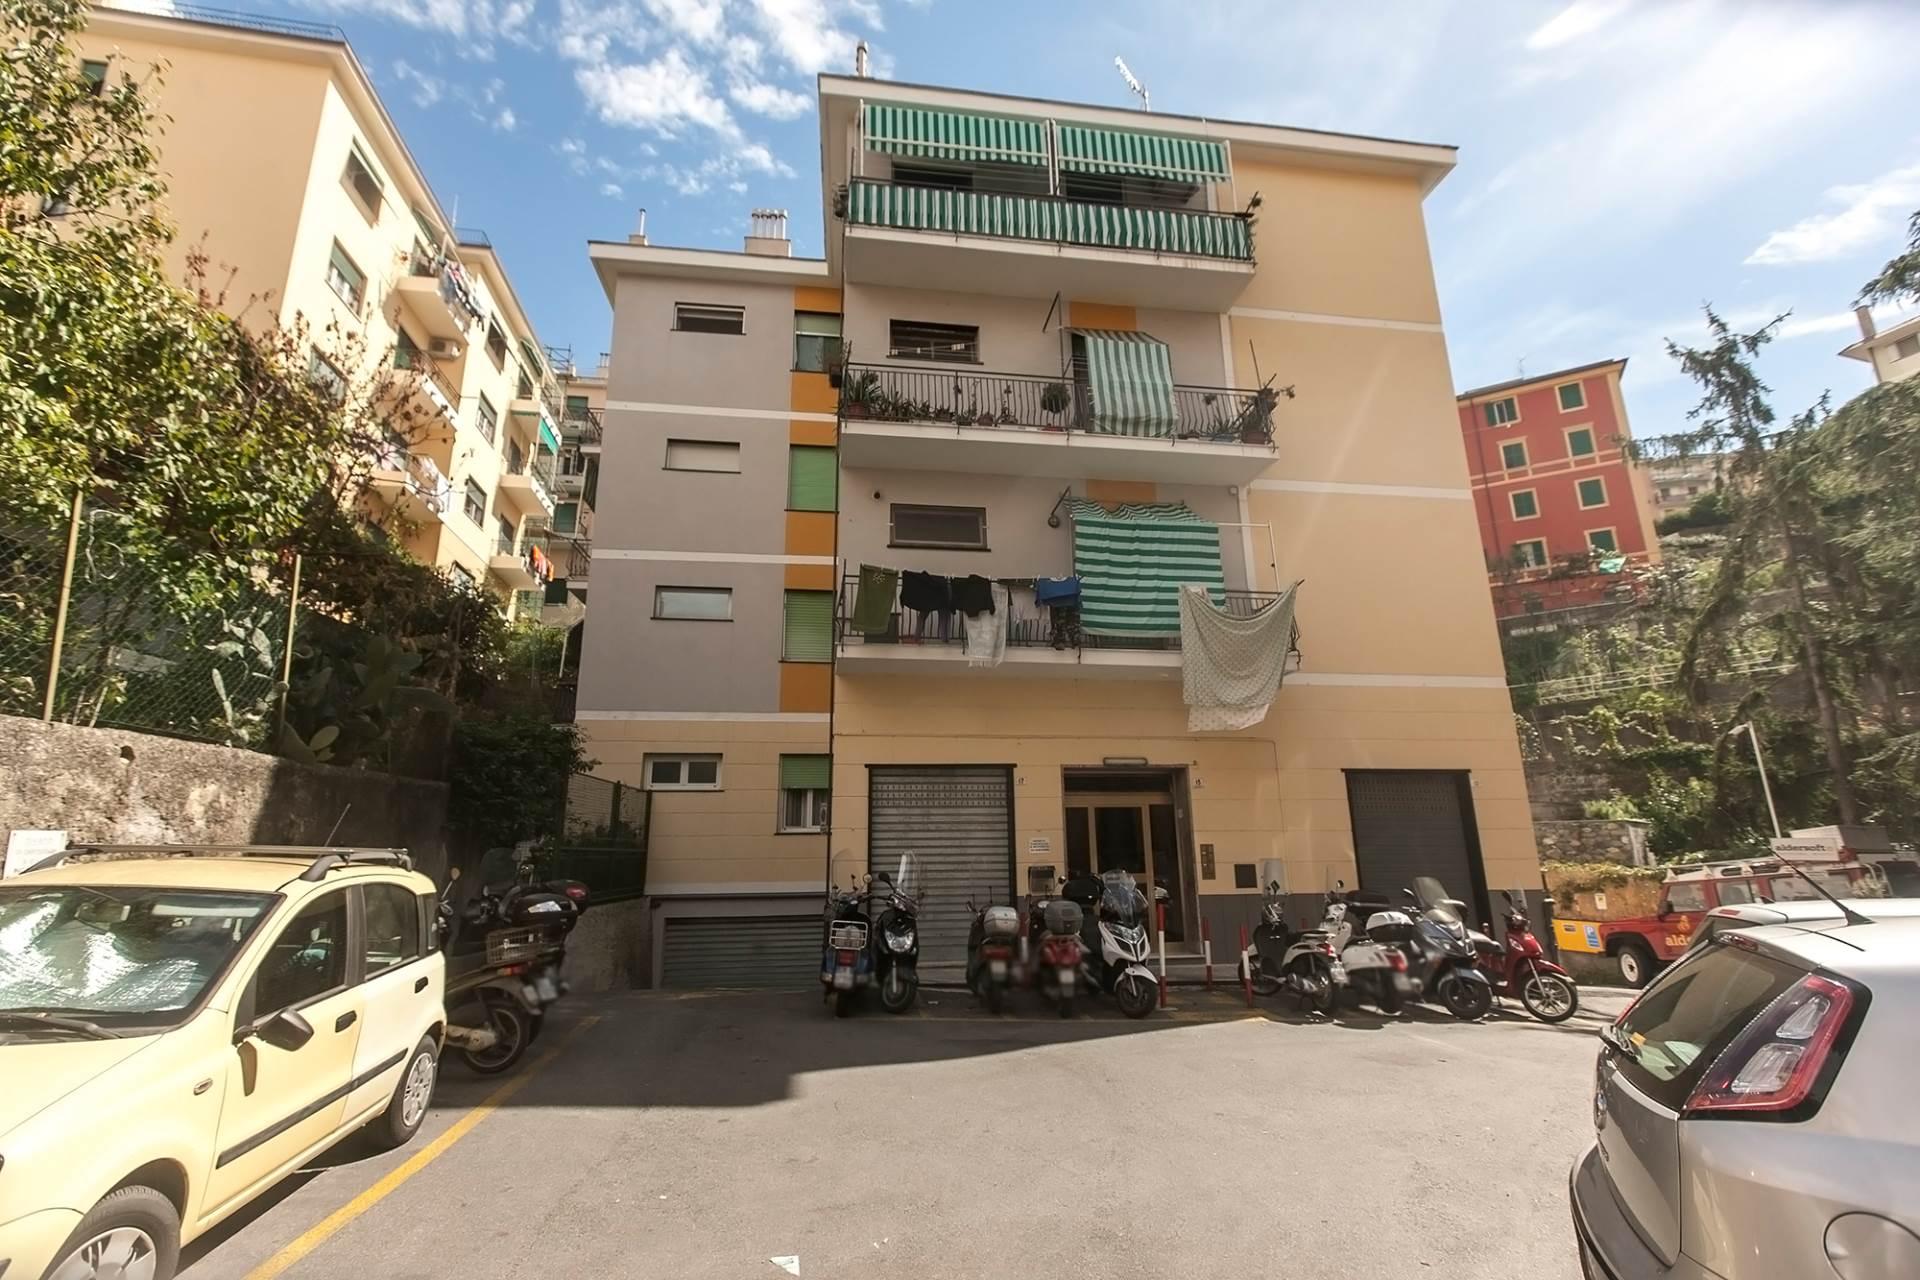 Bilocale Genova Via Armando Pica 1